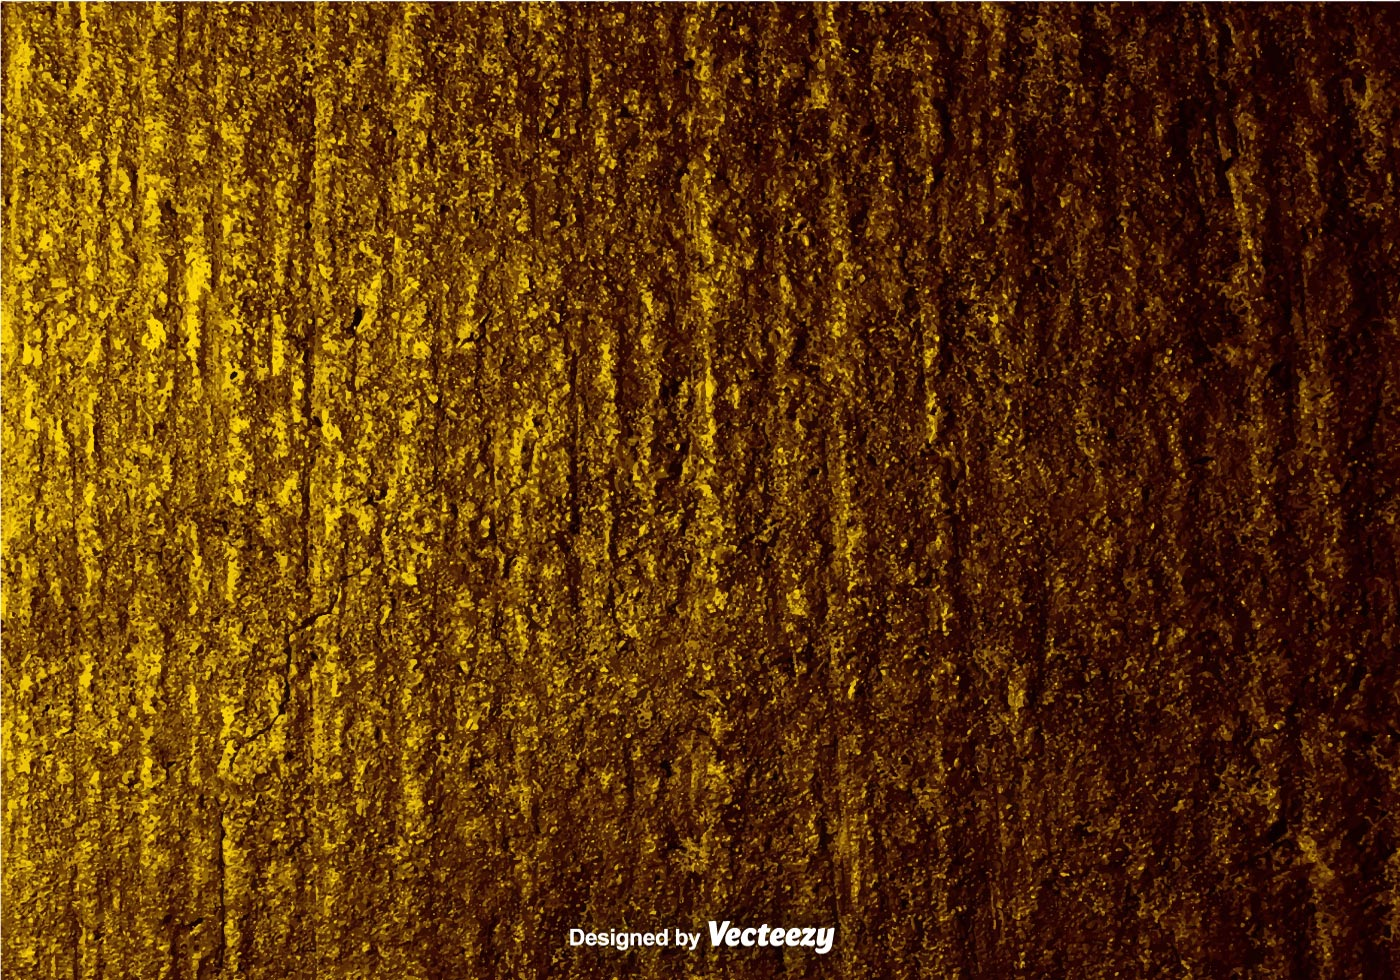 Grunge Surface Vector Texture Download Free Vector Art